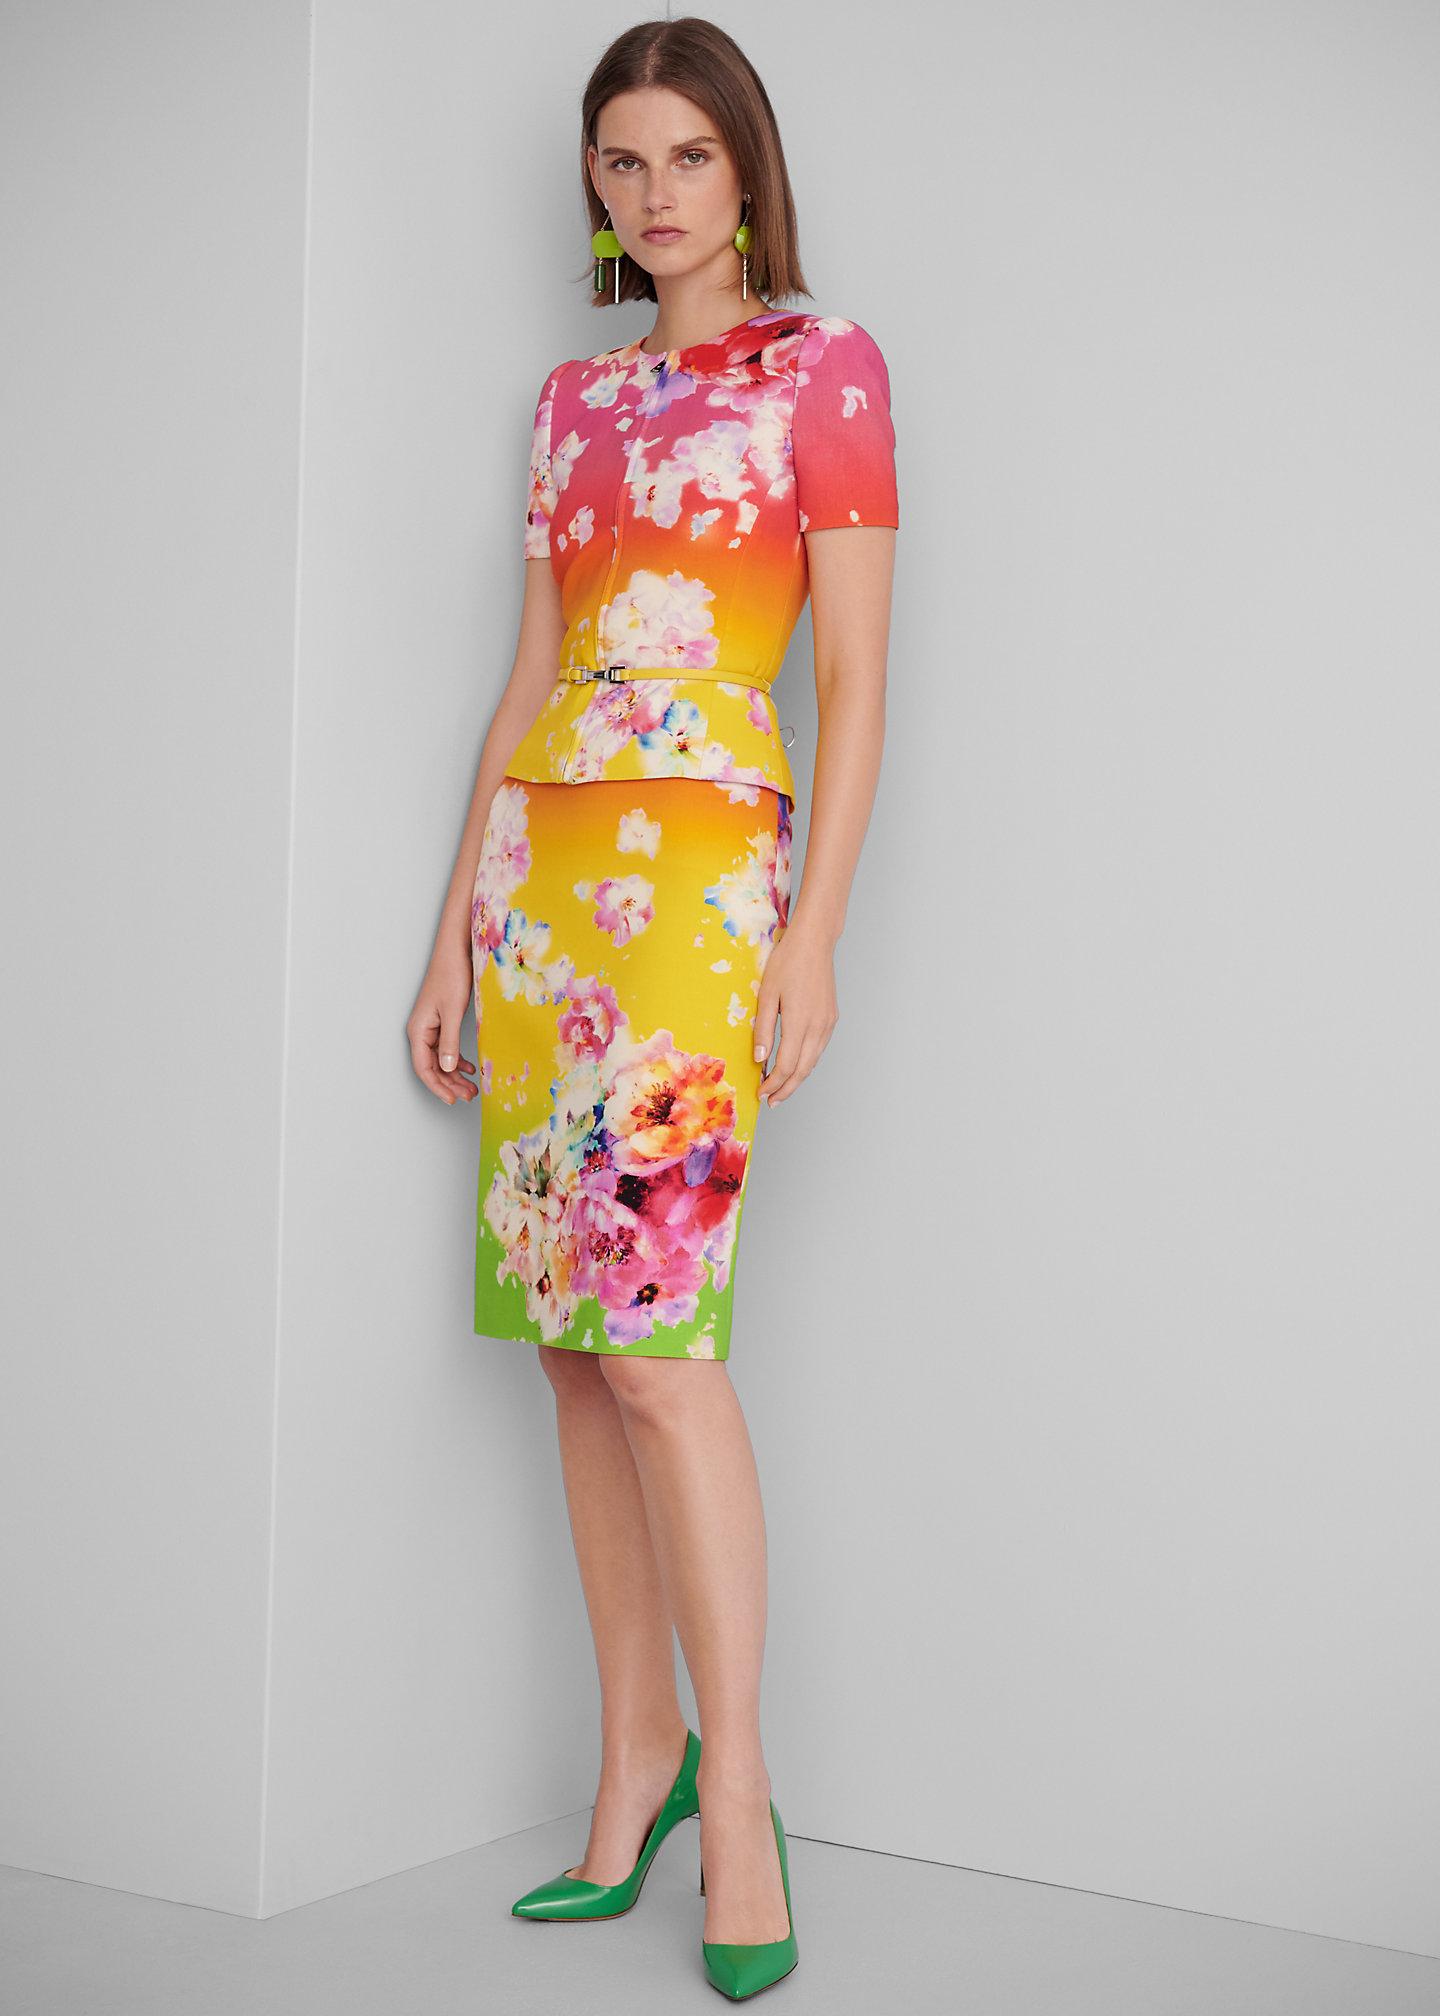 Ralph Lauren Collection Gonna Cynthia in lana sfumata 1